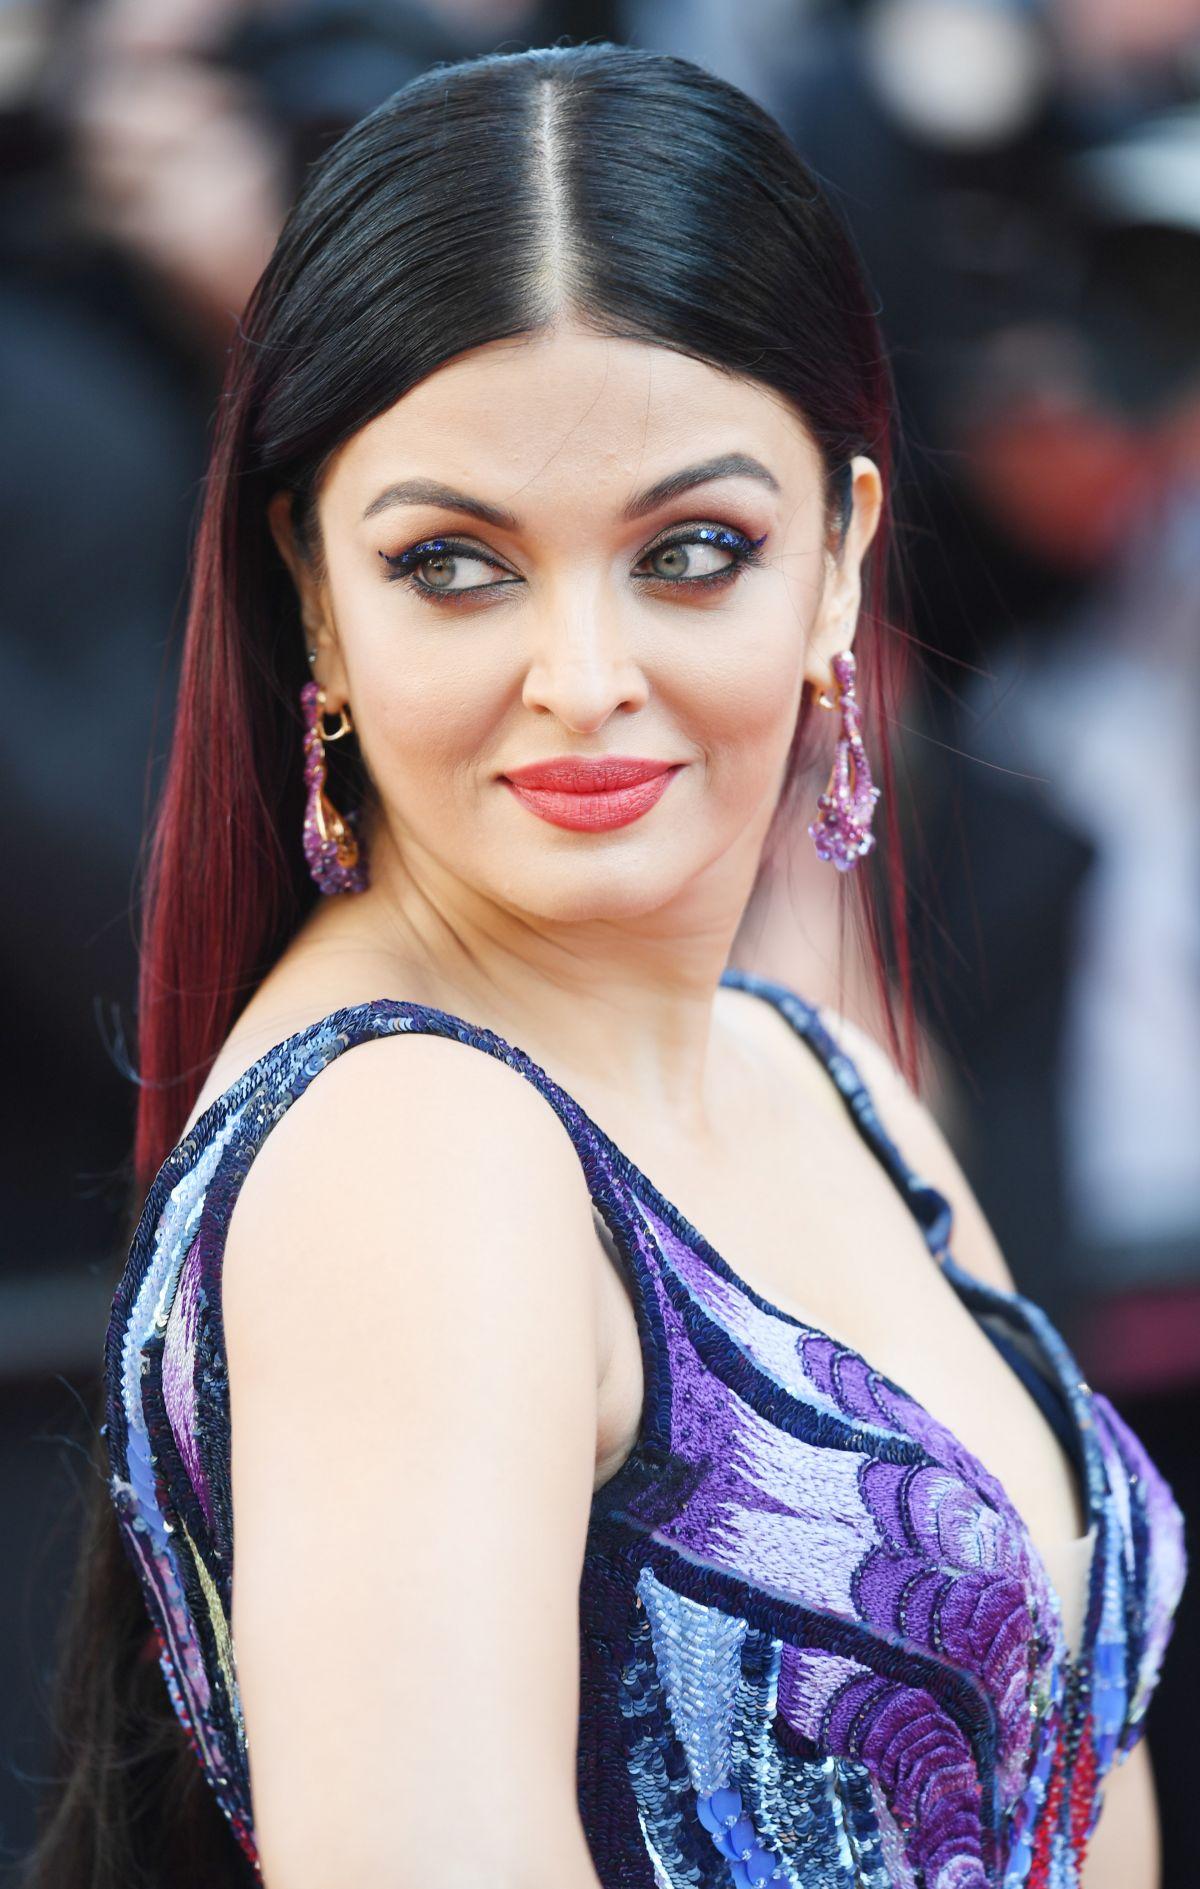 Aishwarya Rai At Girls Of The Sun Premiere At Cannes Film Festival